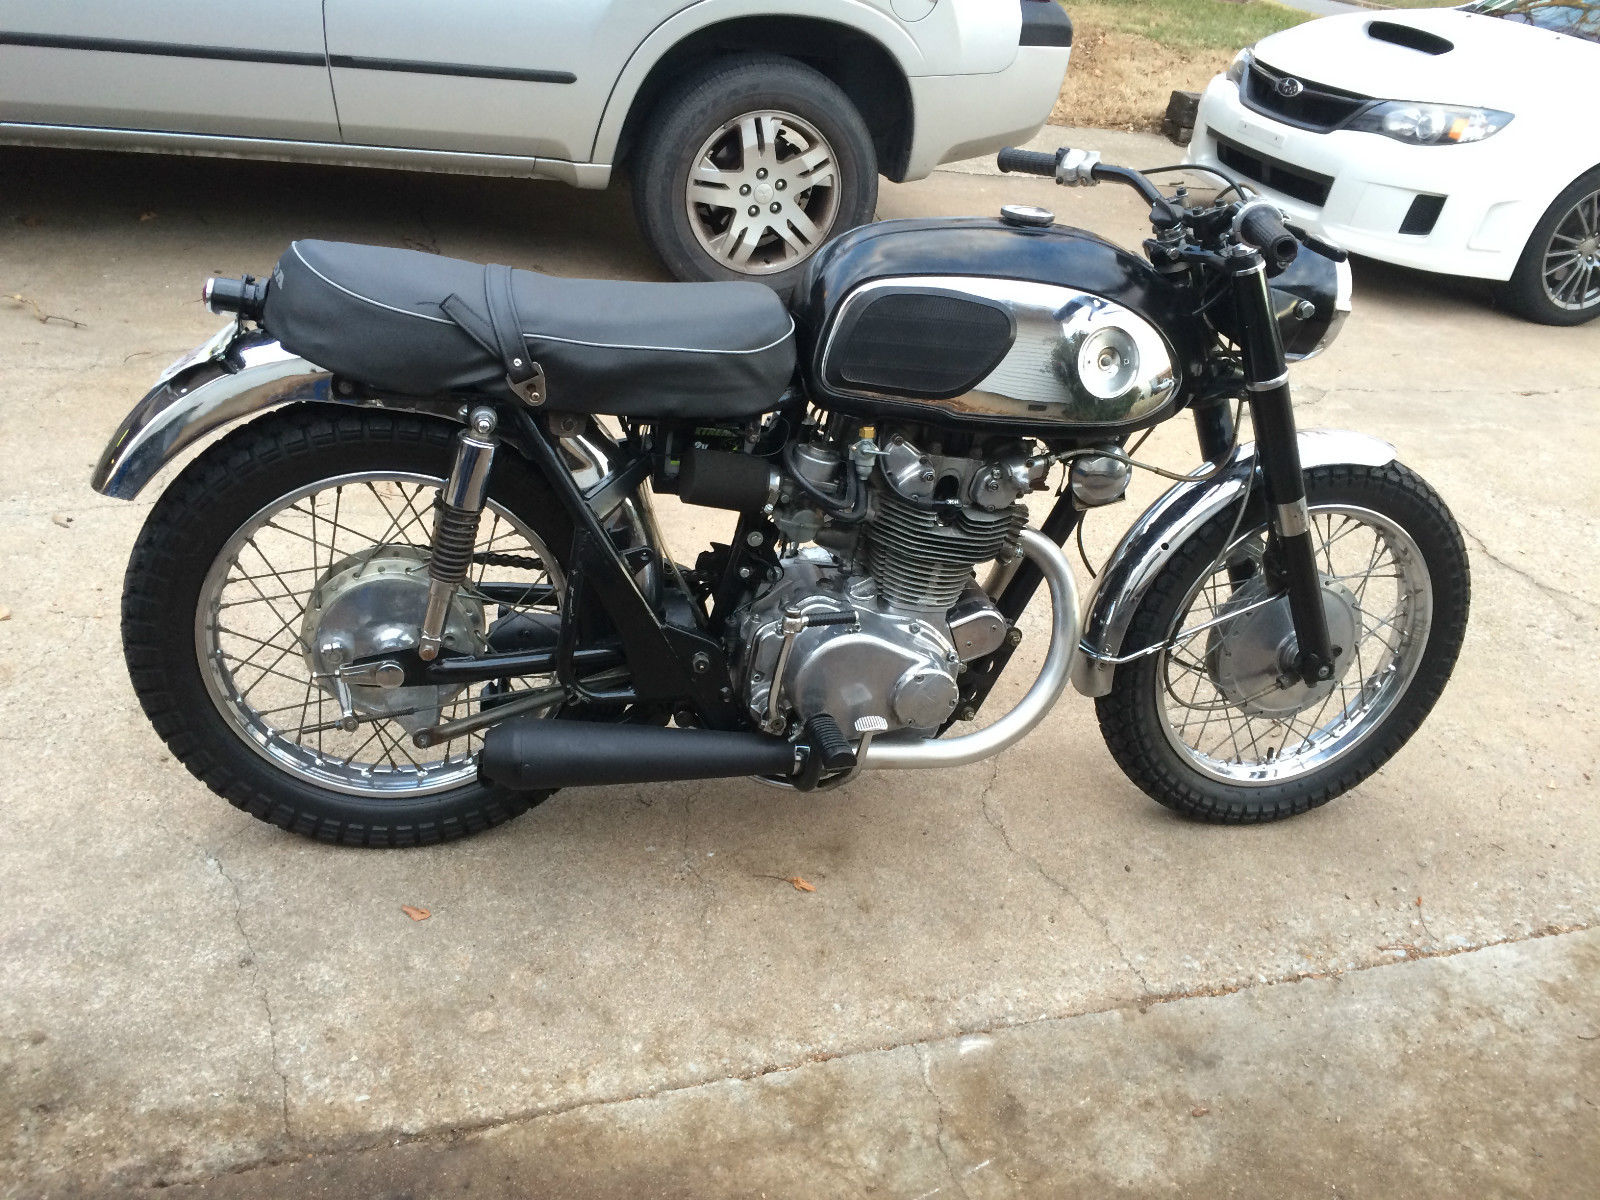 Honda Of Tulsa >> Honda CB450 Bobber, cafe racer, tracker - Authentic, vintage Brat